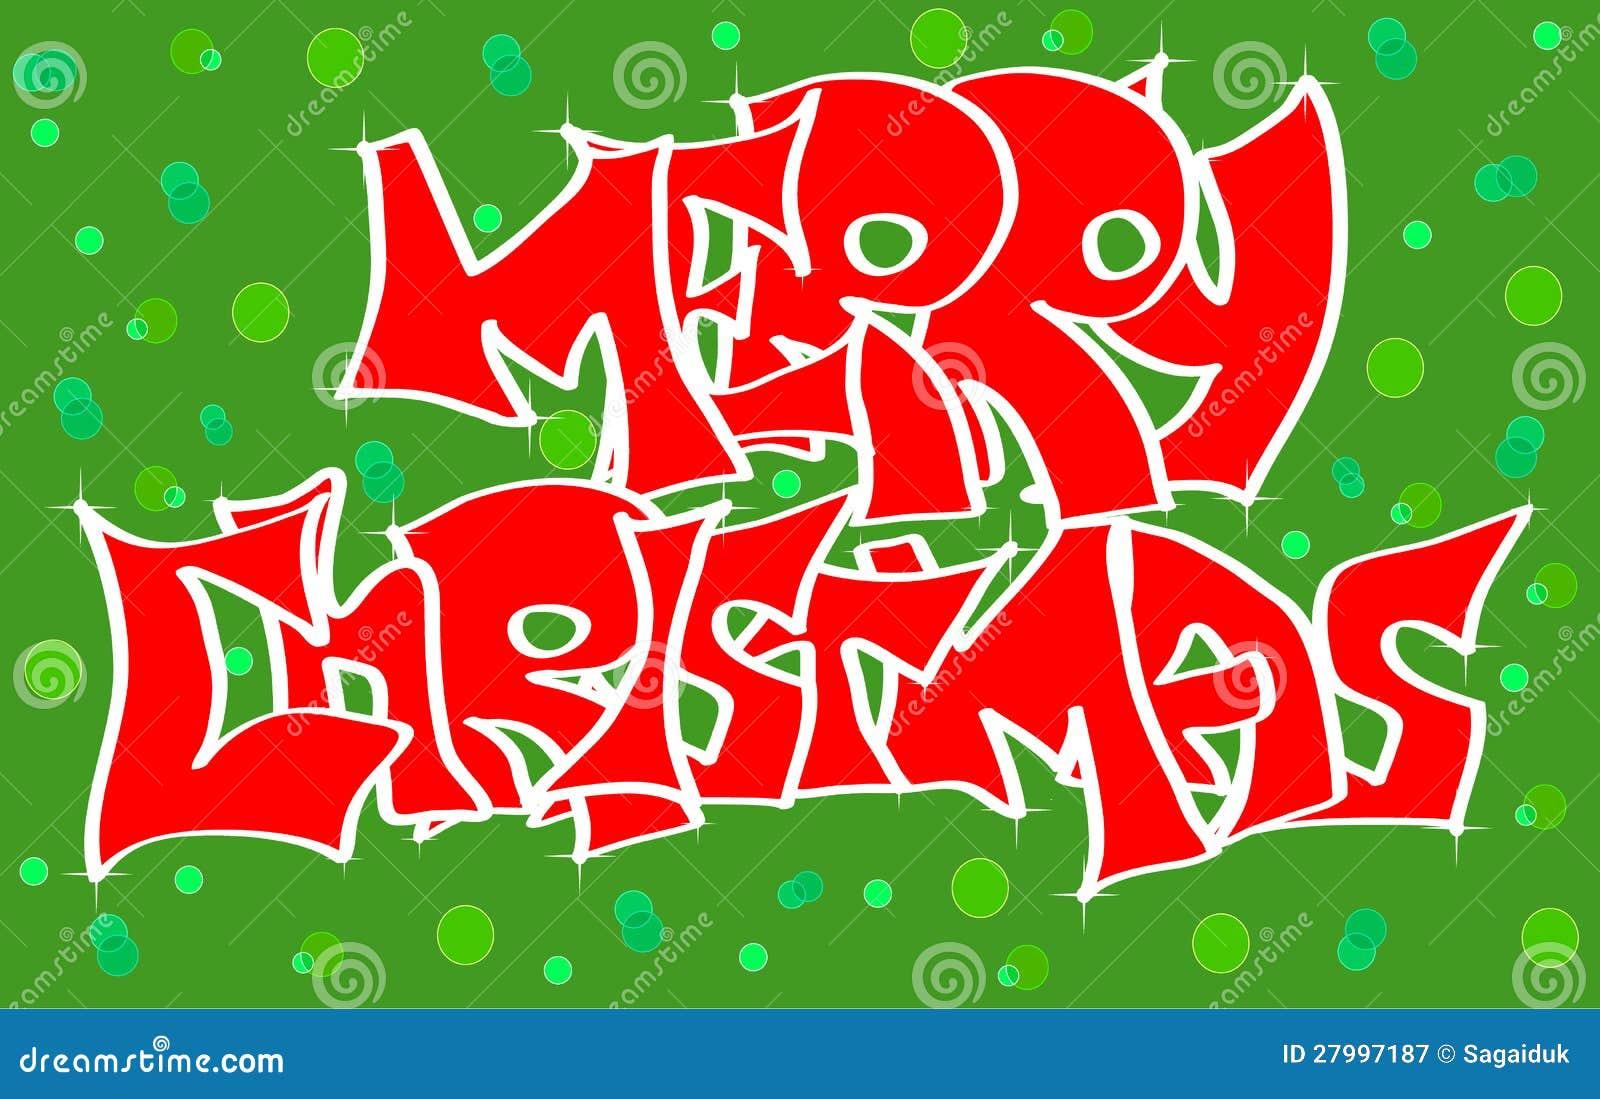 Christmas Graffiti Background.Merry Christmas Graffiti Stock Vector Illustration Of Drawn